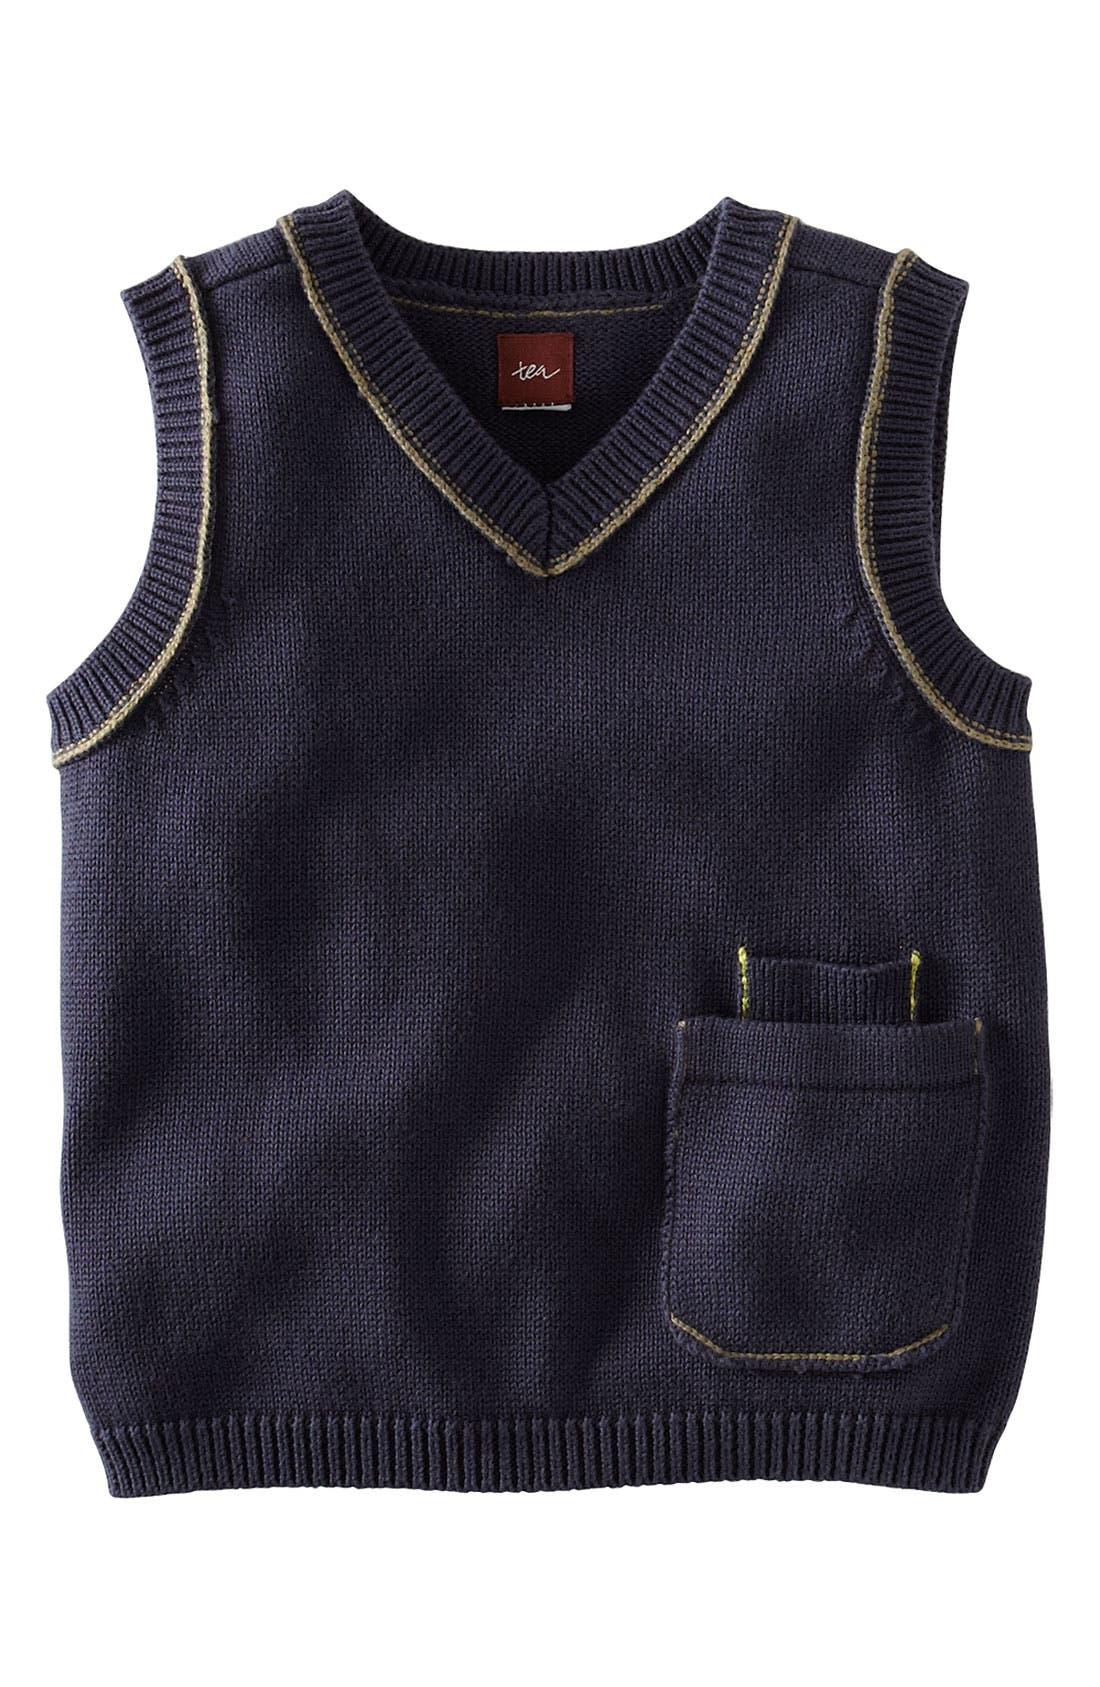 Main Image - Tea Collection 'Perfect Pocket' Vest (Infant)